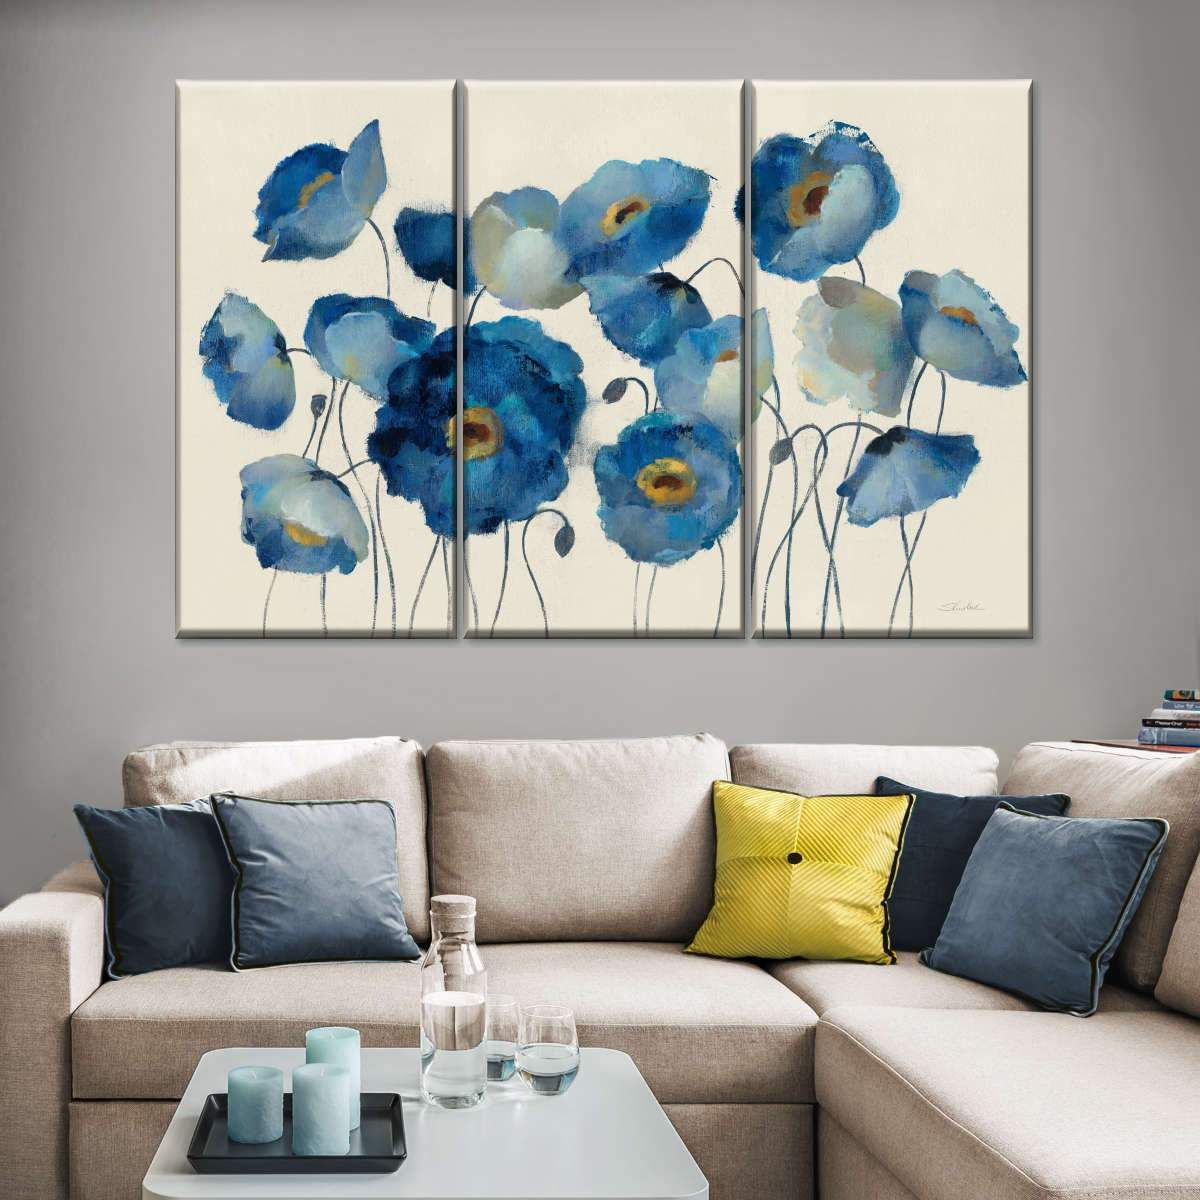 Aquamarine Floral On Cream Multi Panel Canvas Wall Art In 2021 Canvas Wall Art Abstract Canvas Wall Art Wall Canvas